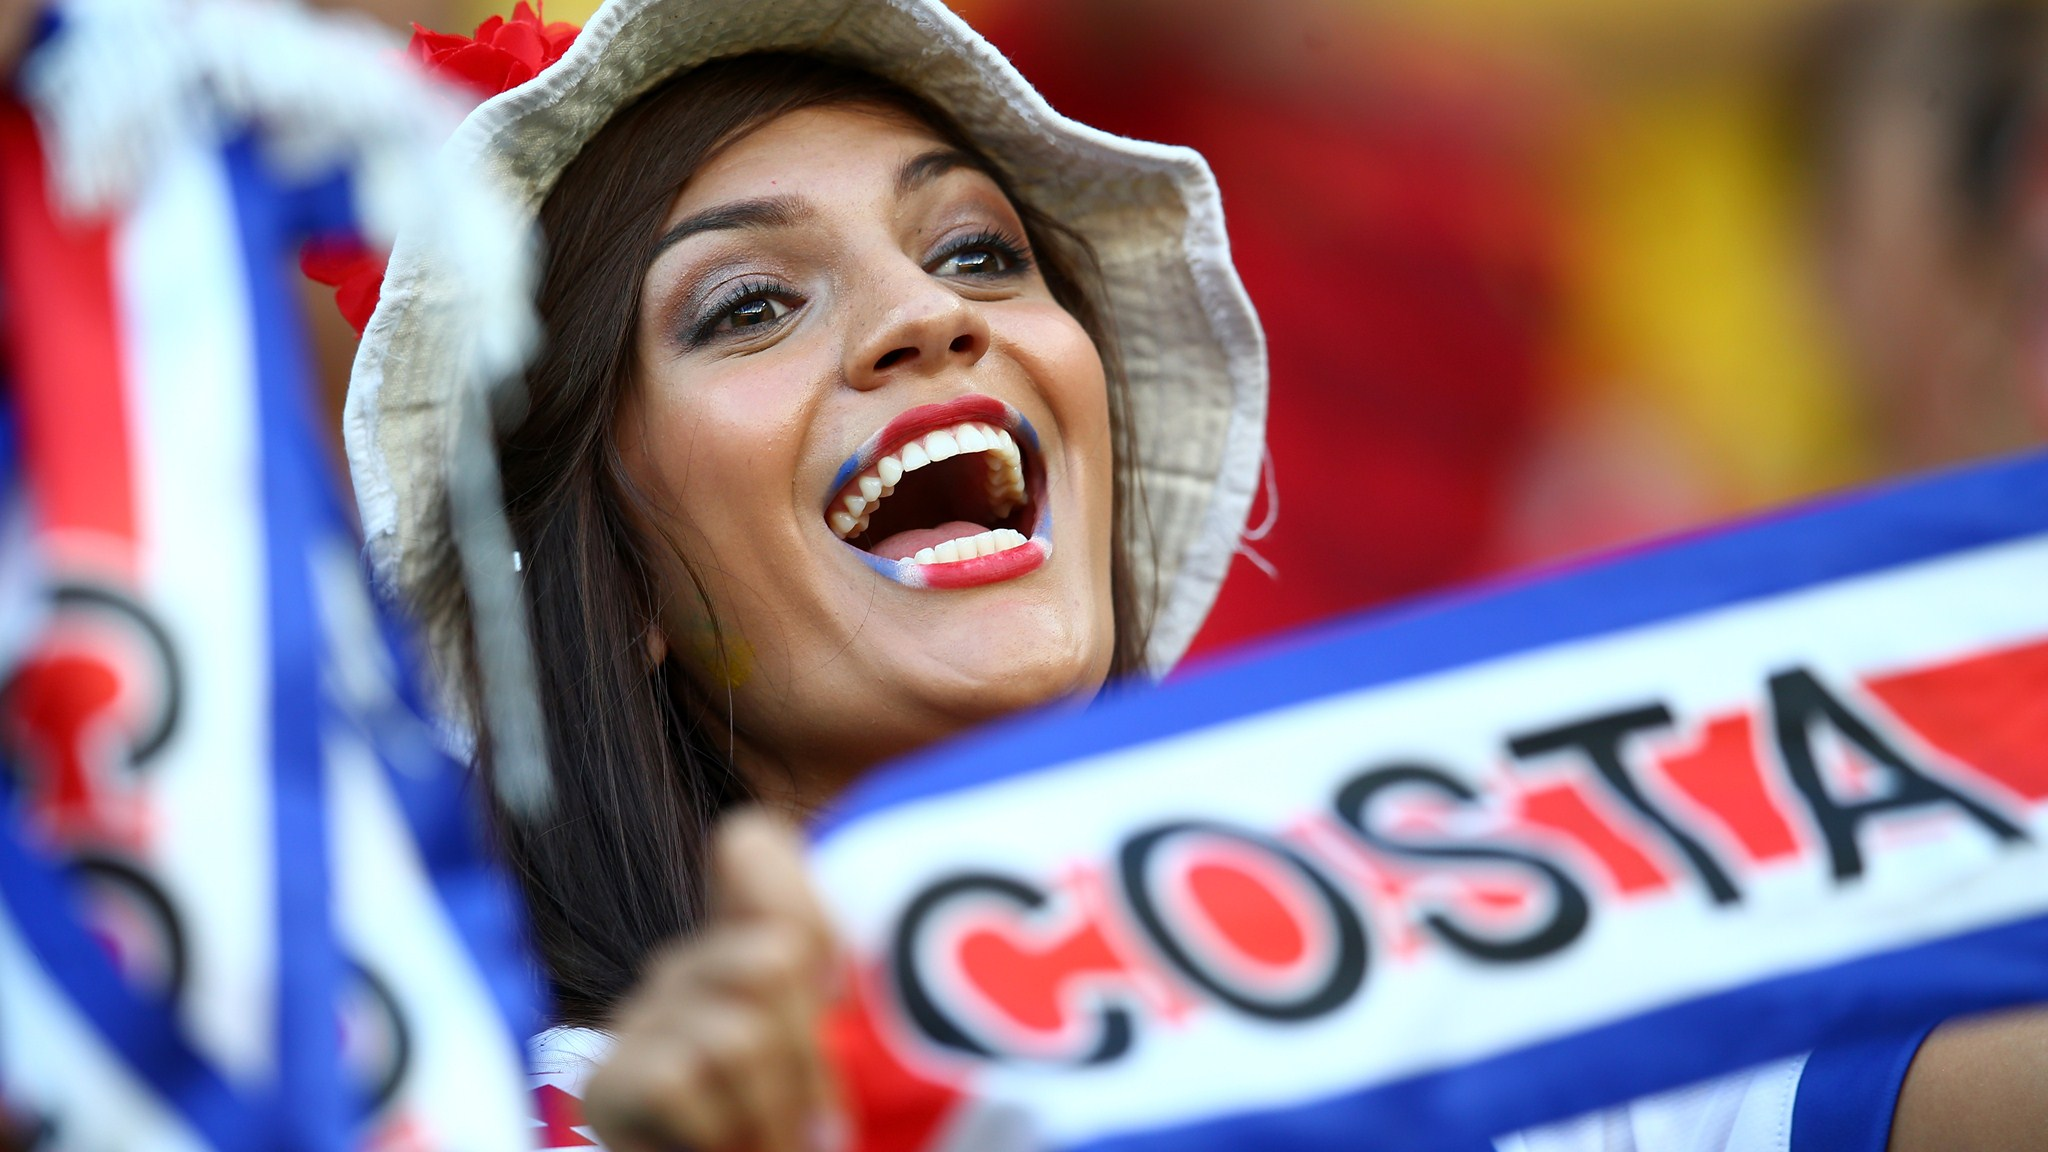 170 - Costa Rica-Greece [1-1 - Costa Rica win on penalties (5 - 3)] -- 29 Jun 2014 - 17-00